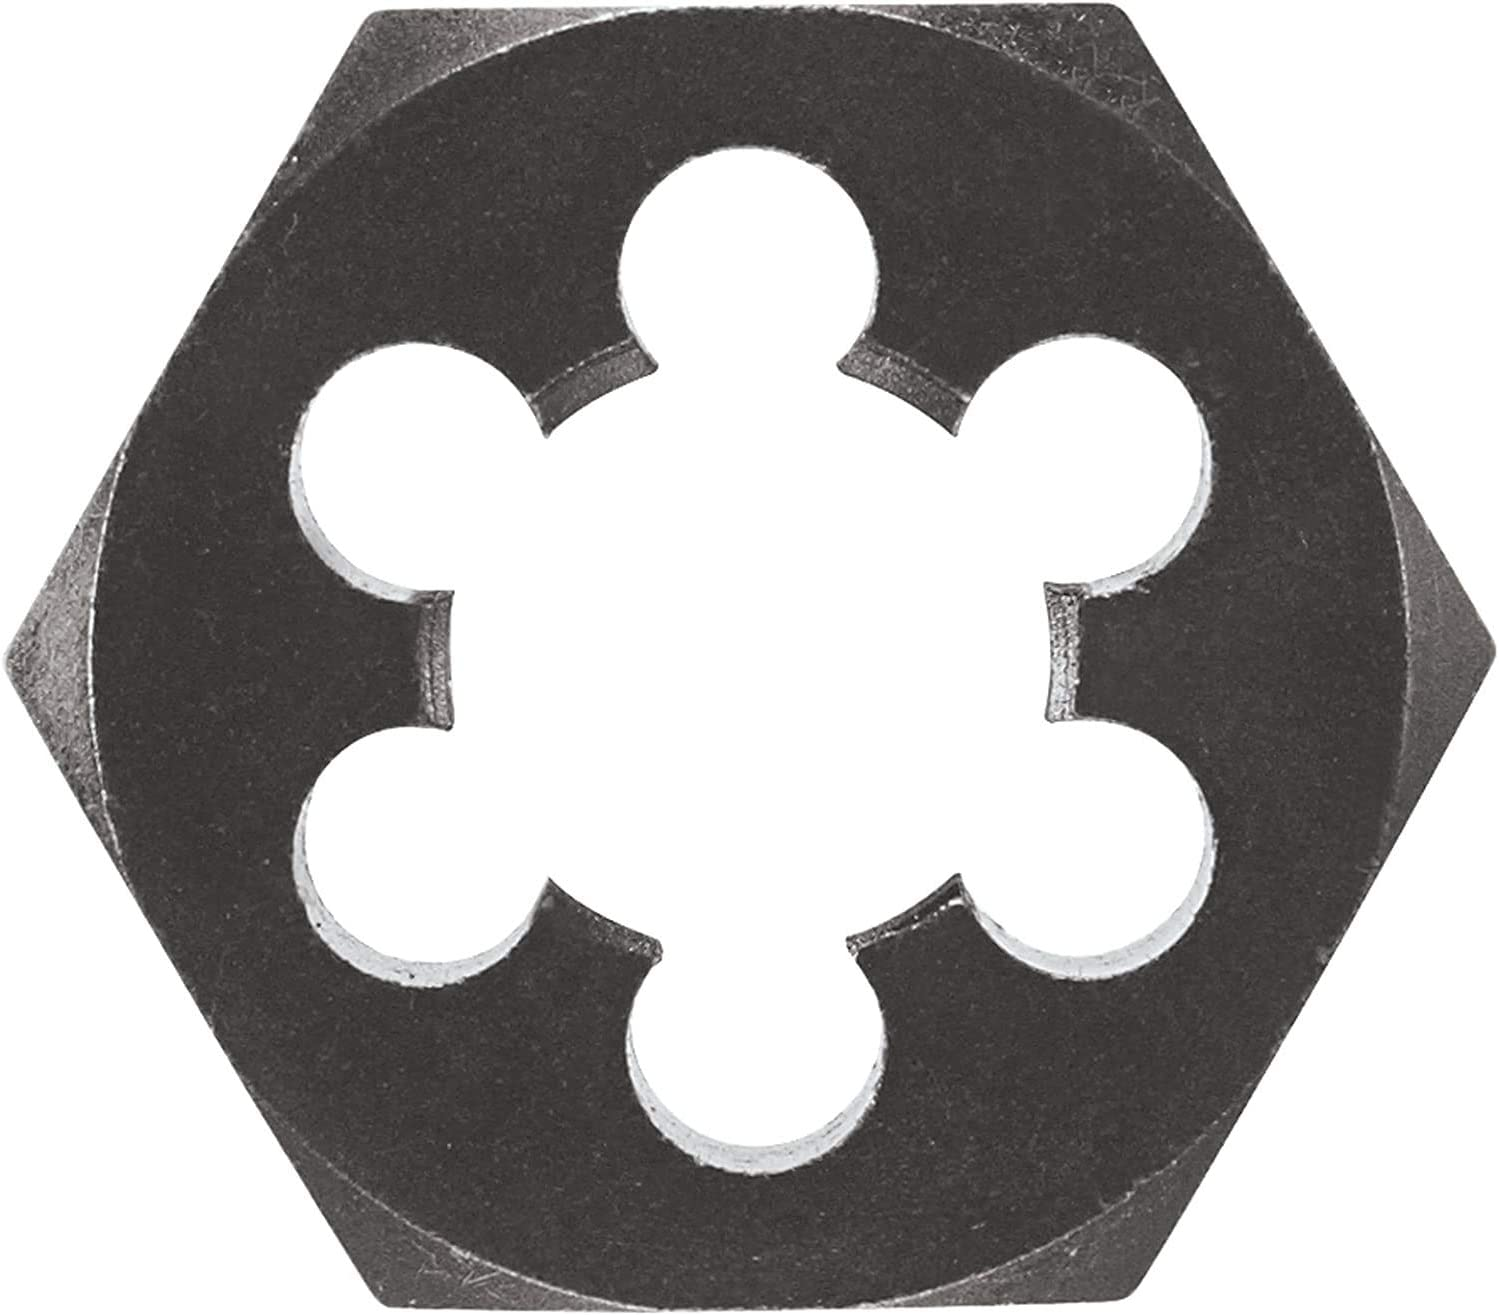 Utoolmart 15/×6.3mm Hex Pipe Rethreading Die Carbon Steel Industrial Pro Hexagonal Re-Threading Hex Metric Die for Taper Pipe Threads 1pcs